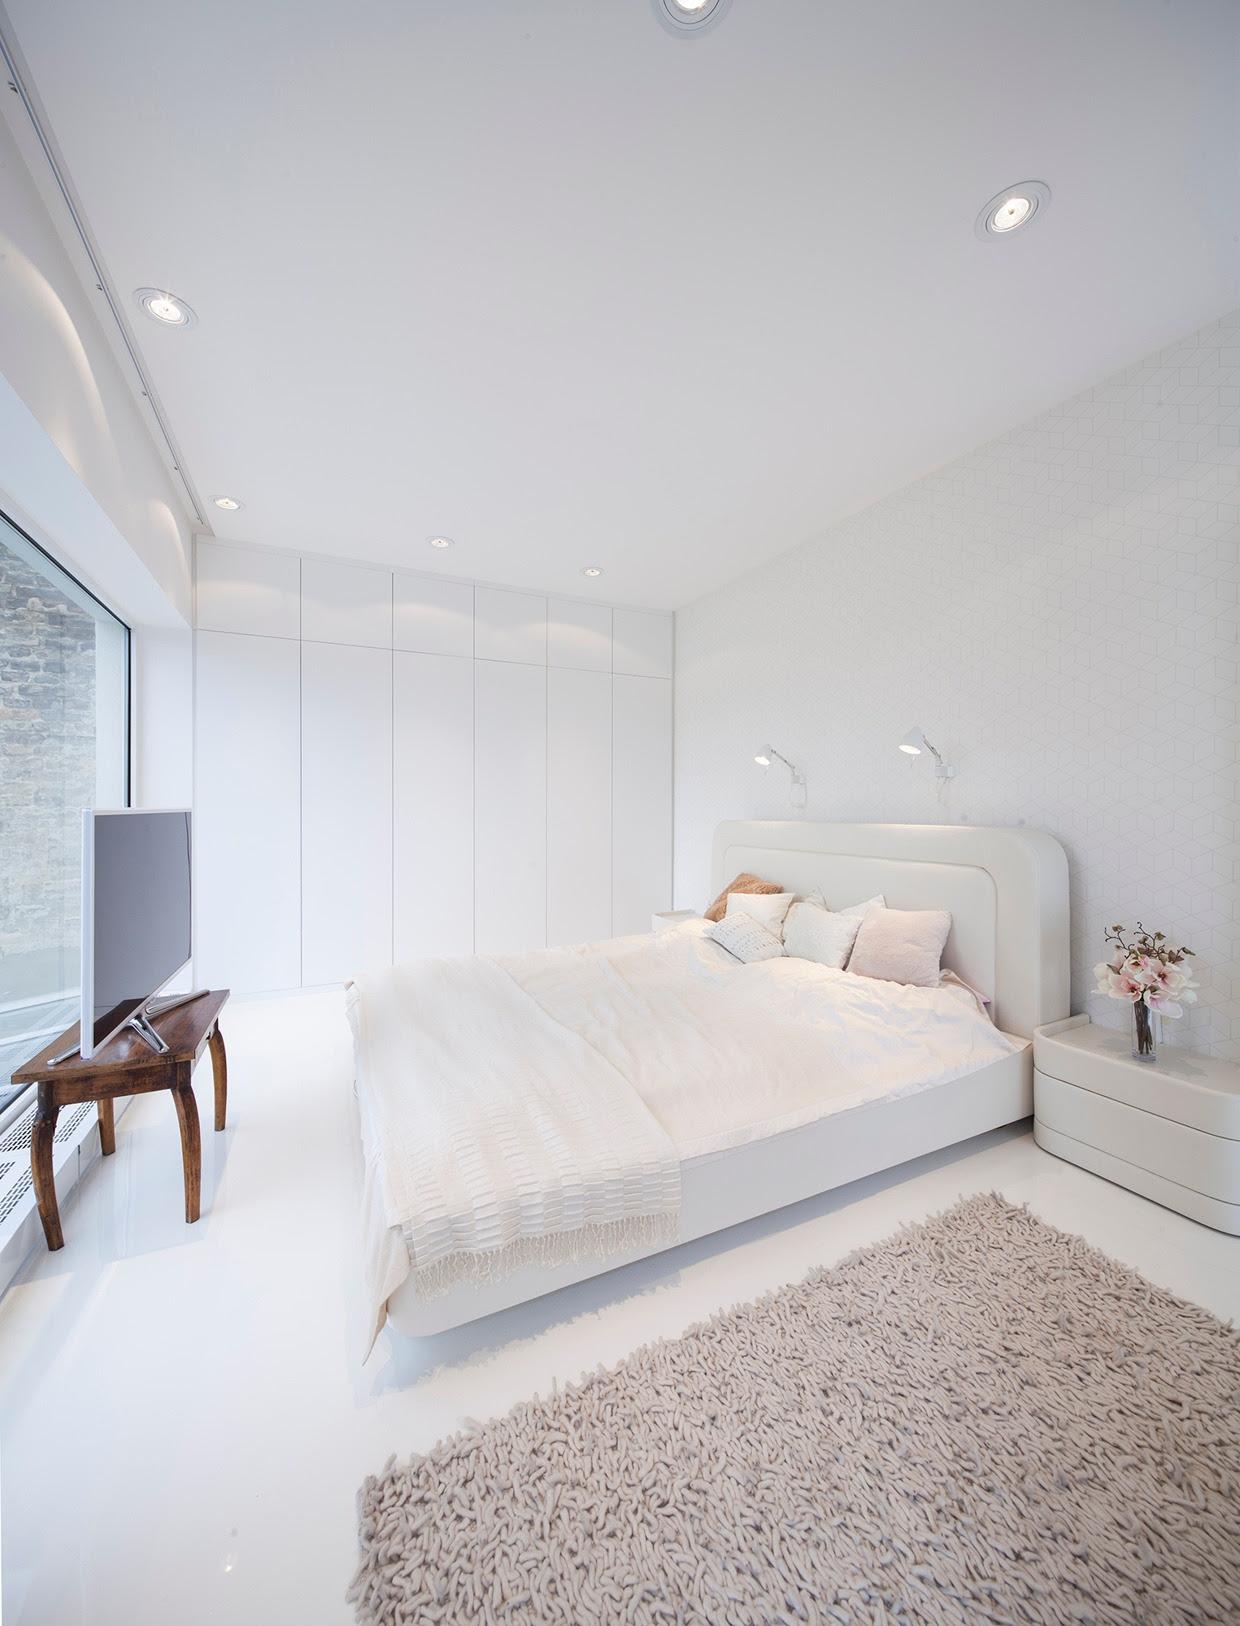 Hungarian Loft Design Uses a Simple iAesthetici for Big